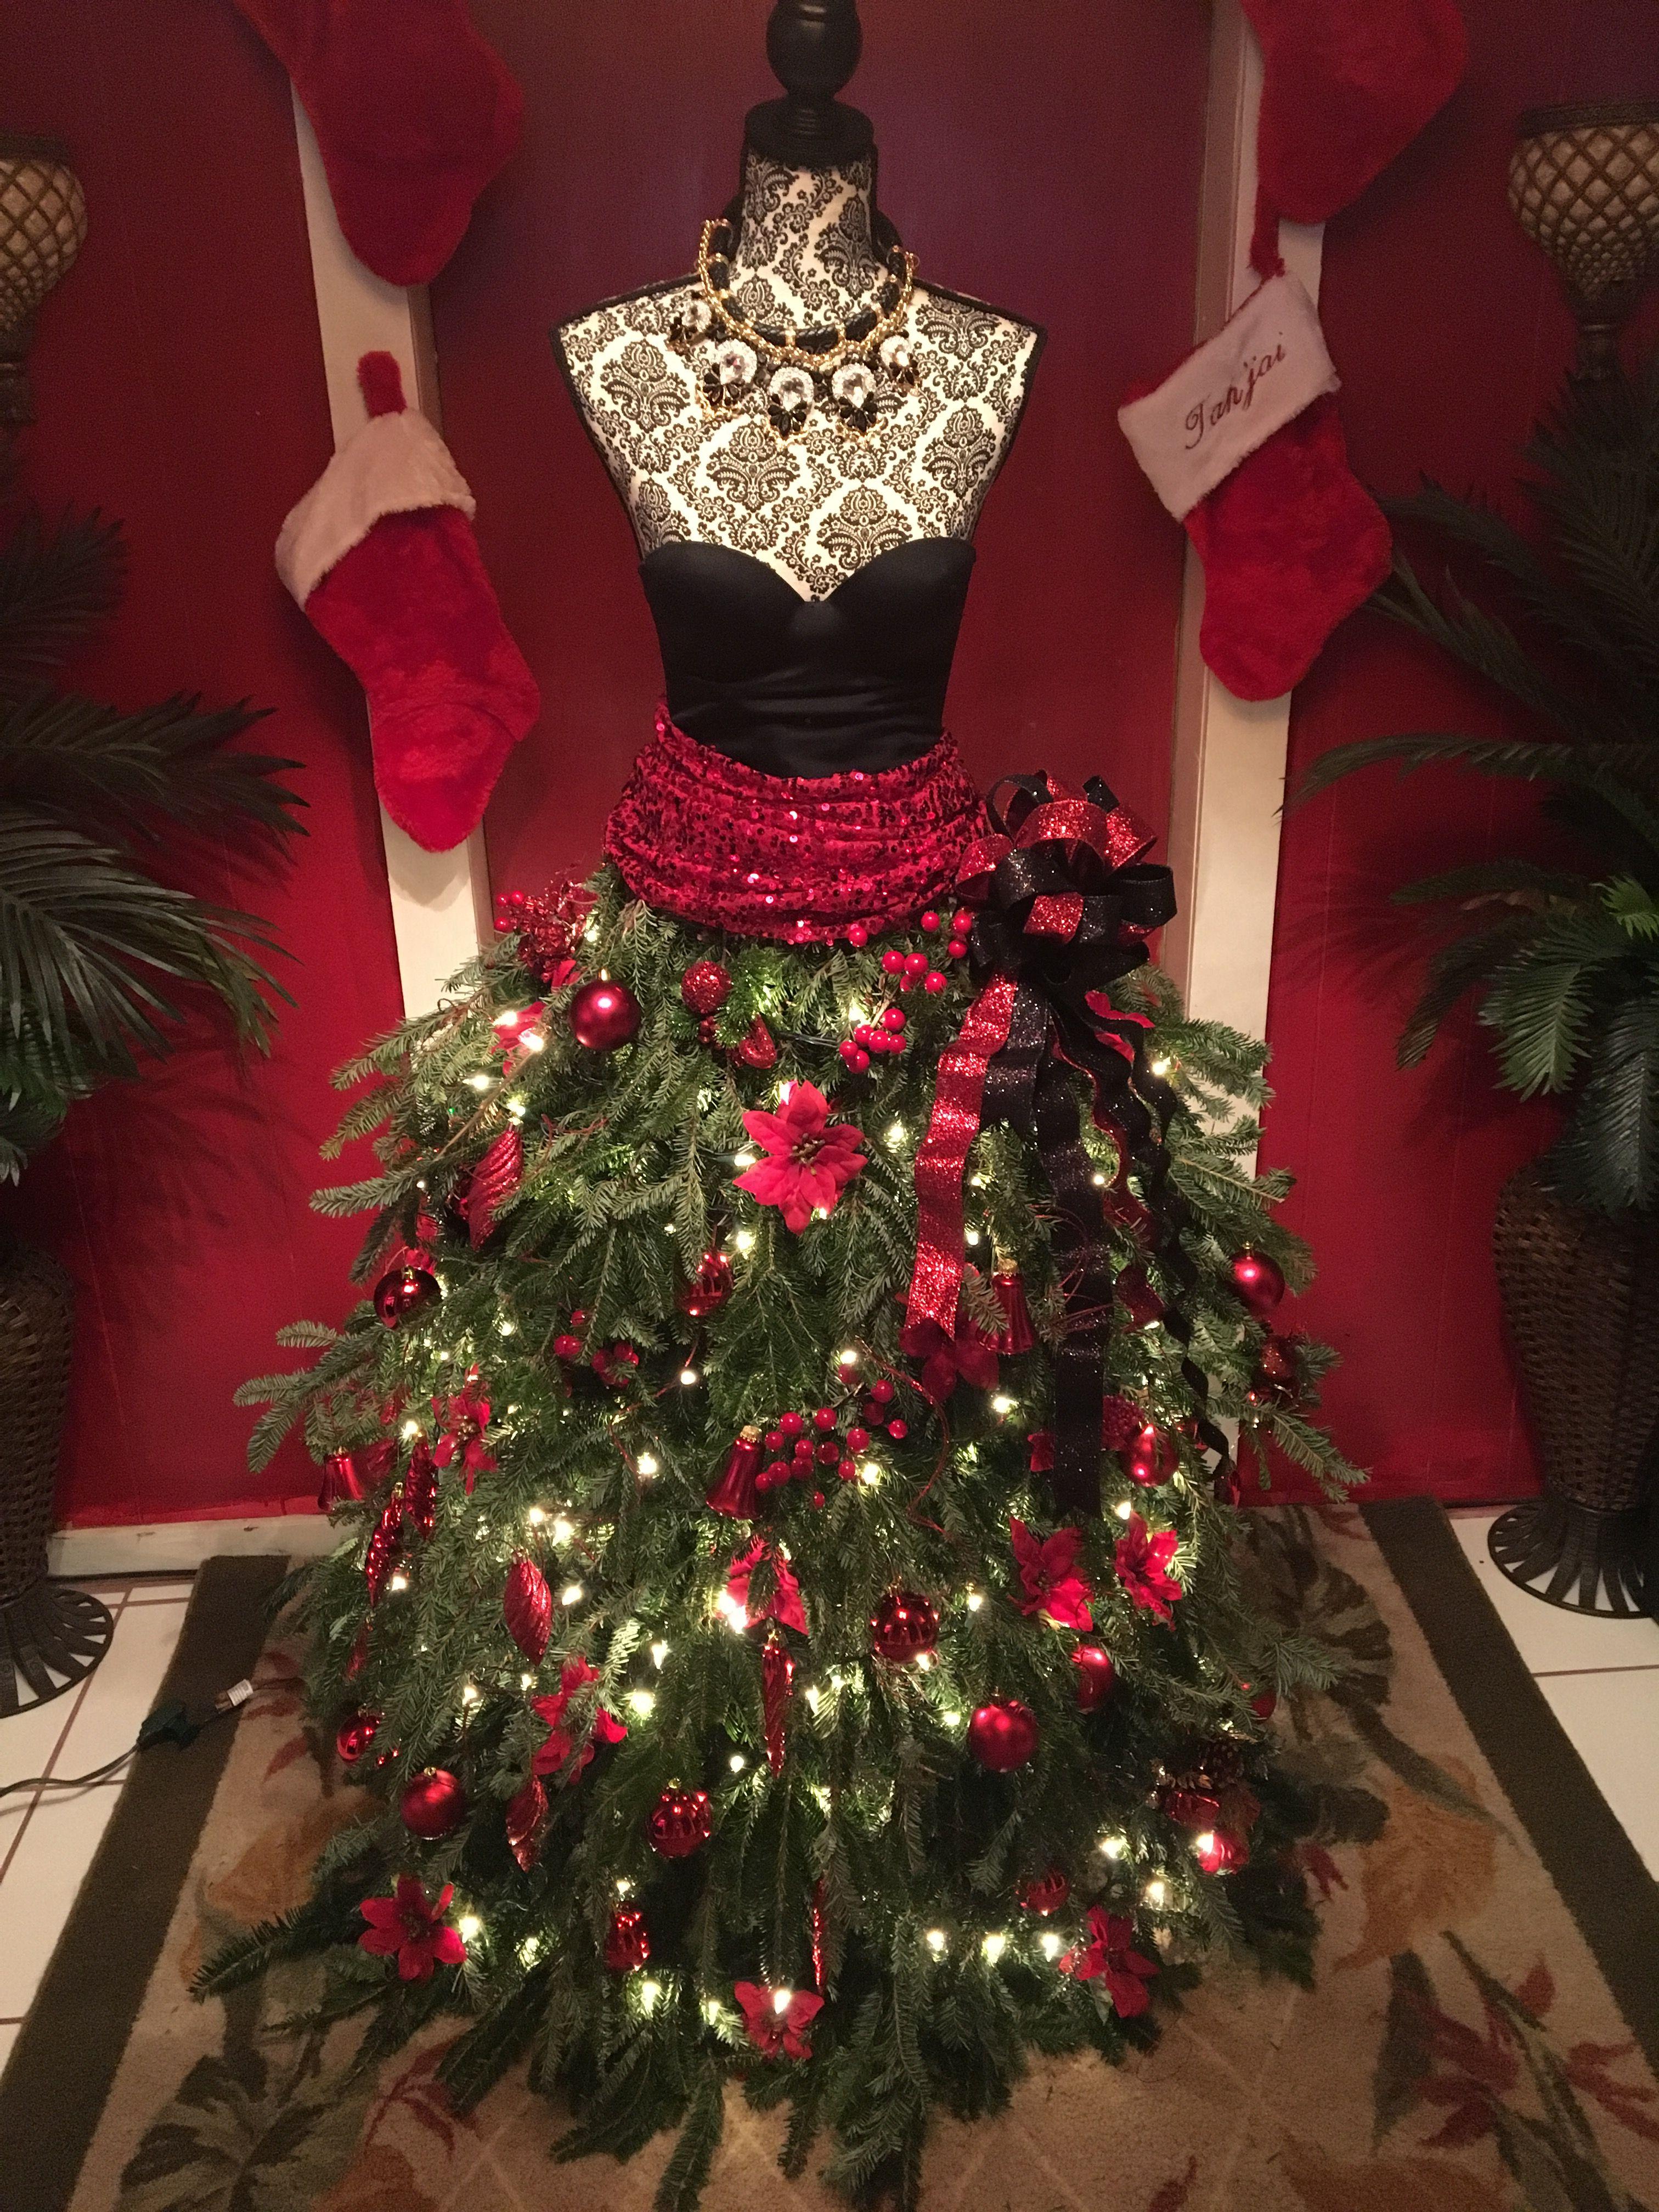 Mannequin Christmas Tree Dress Christmas Tree Dress Dress Form Christmas Tree Mannequin Christmas Tree